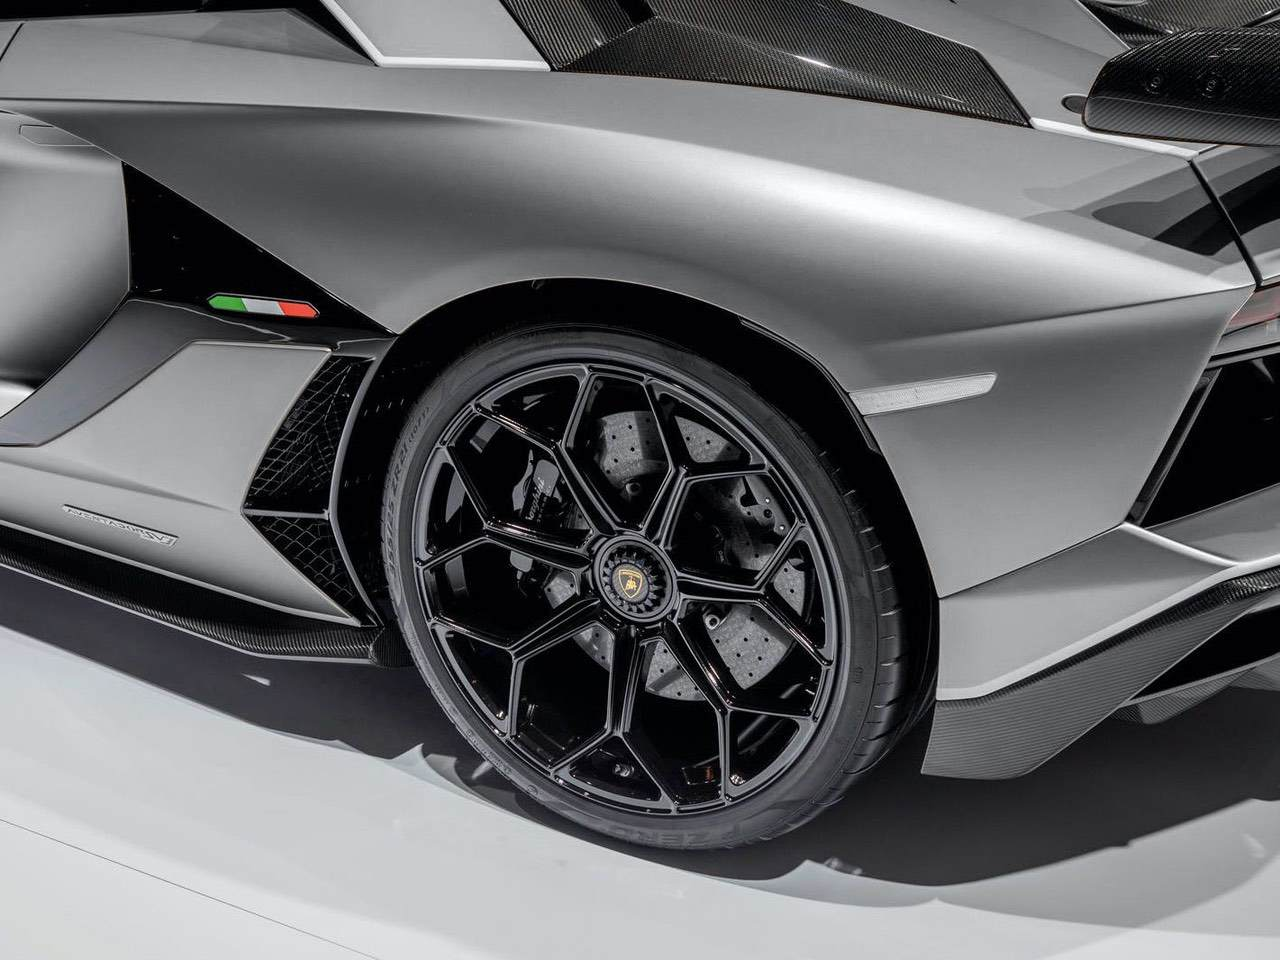 Lamborghini-Aventador-SVJ-Roadster-Grey-8